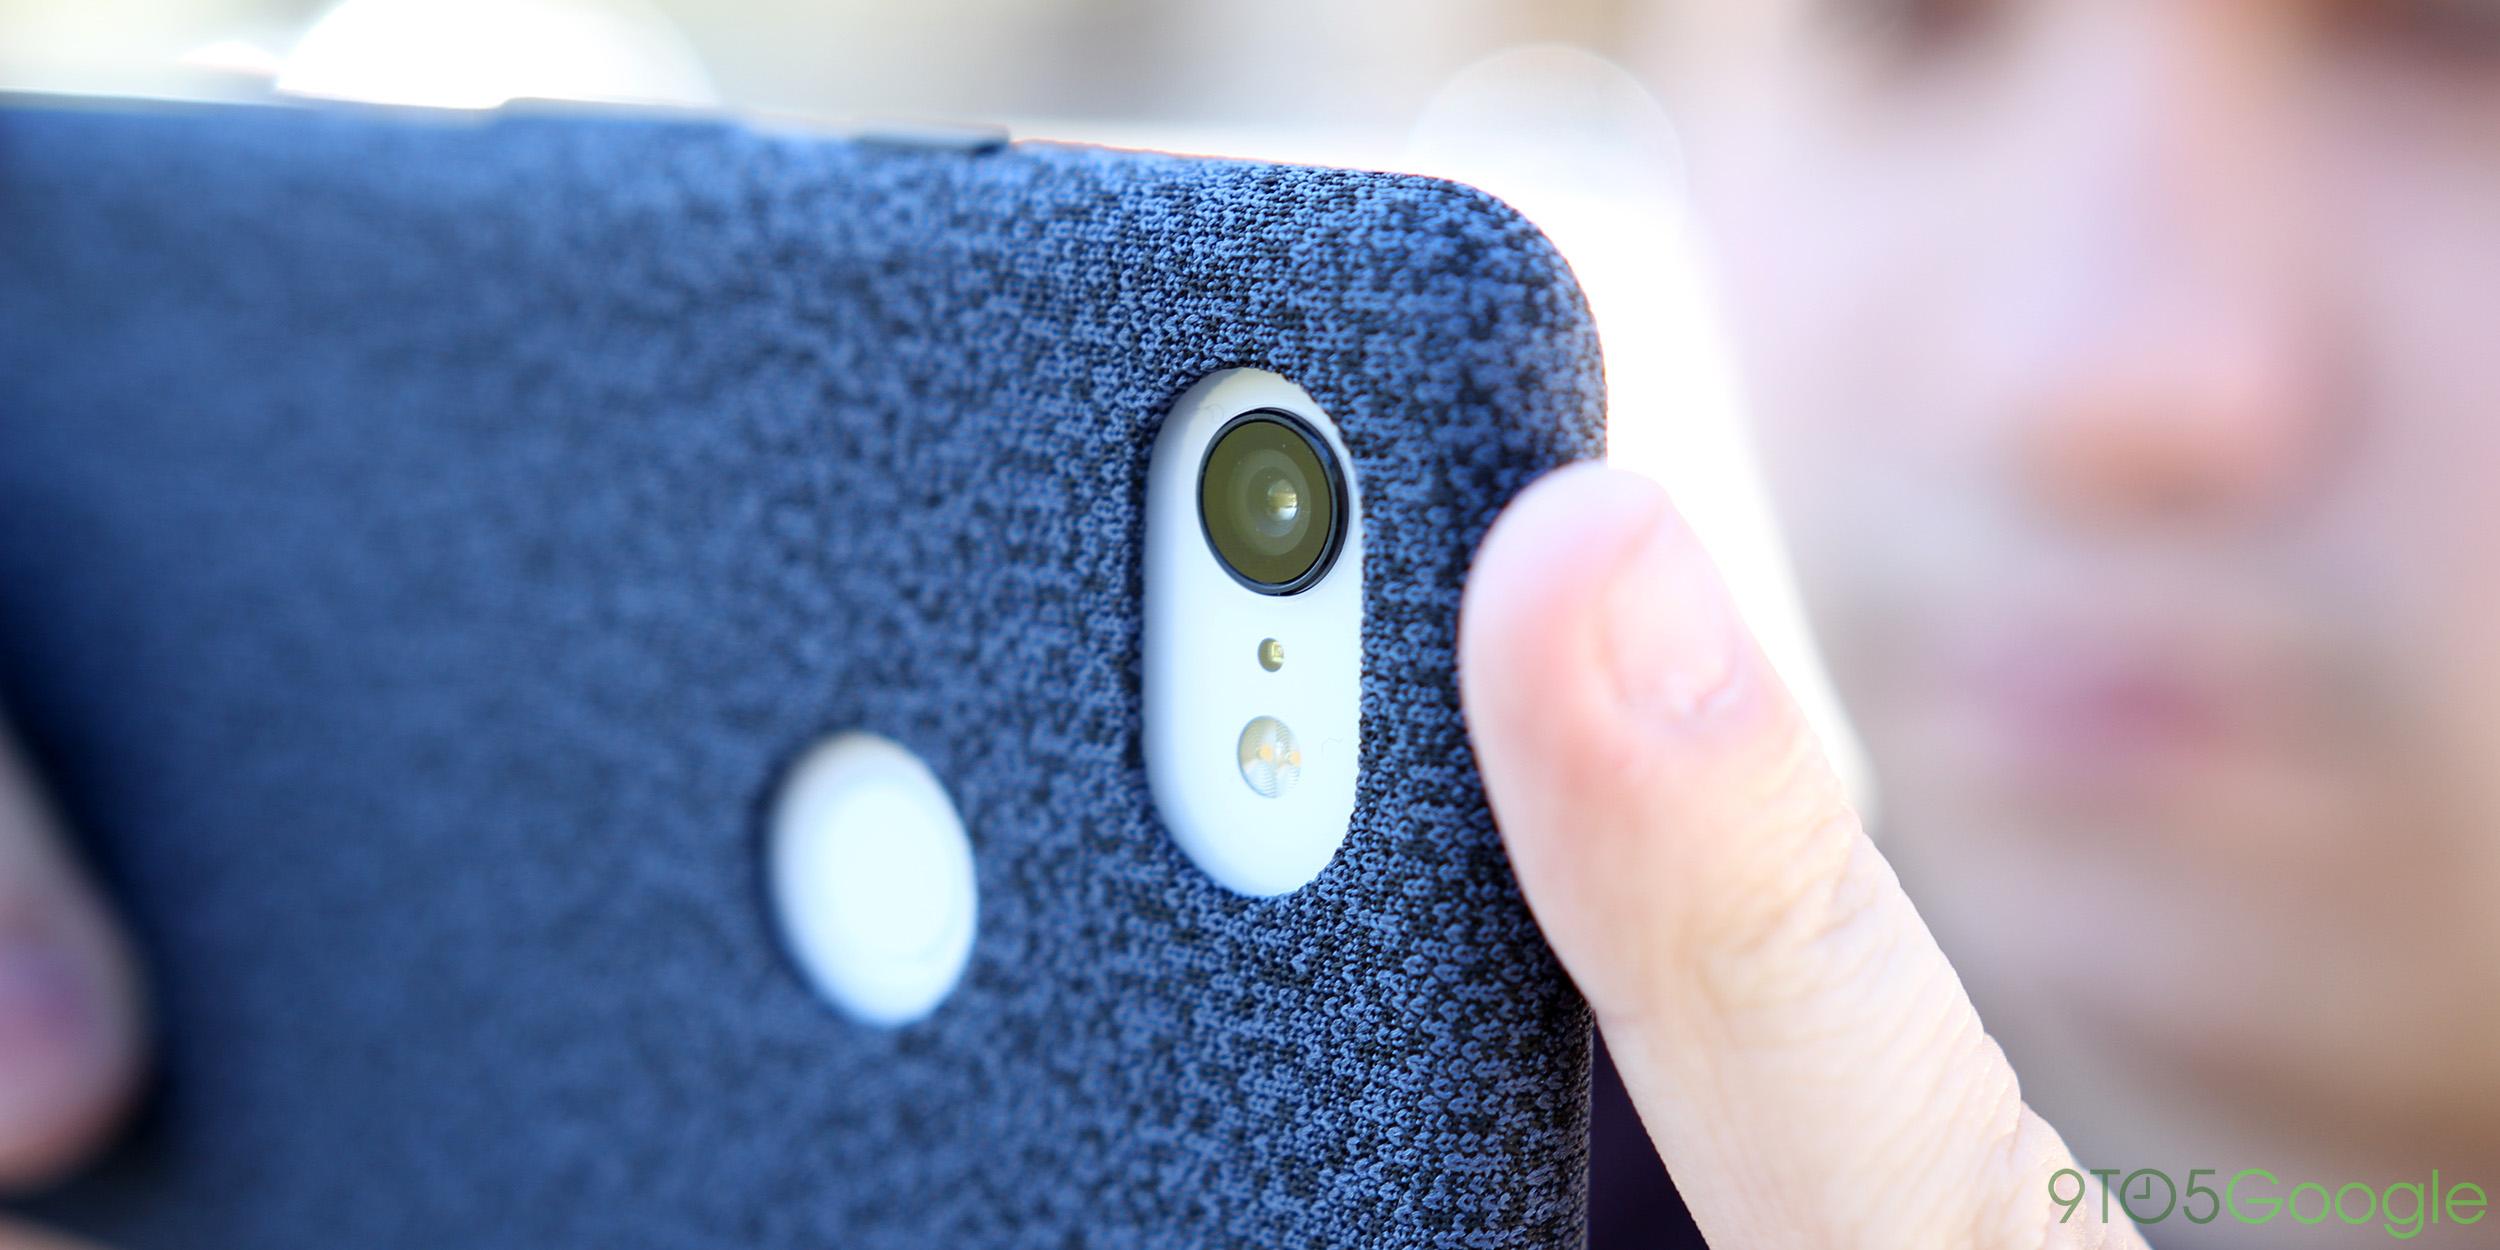 камера Google Pixel 3 xl - -